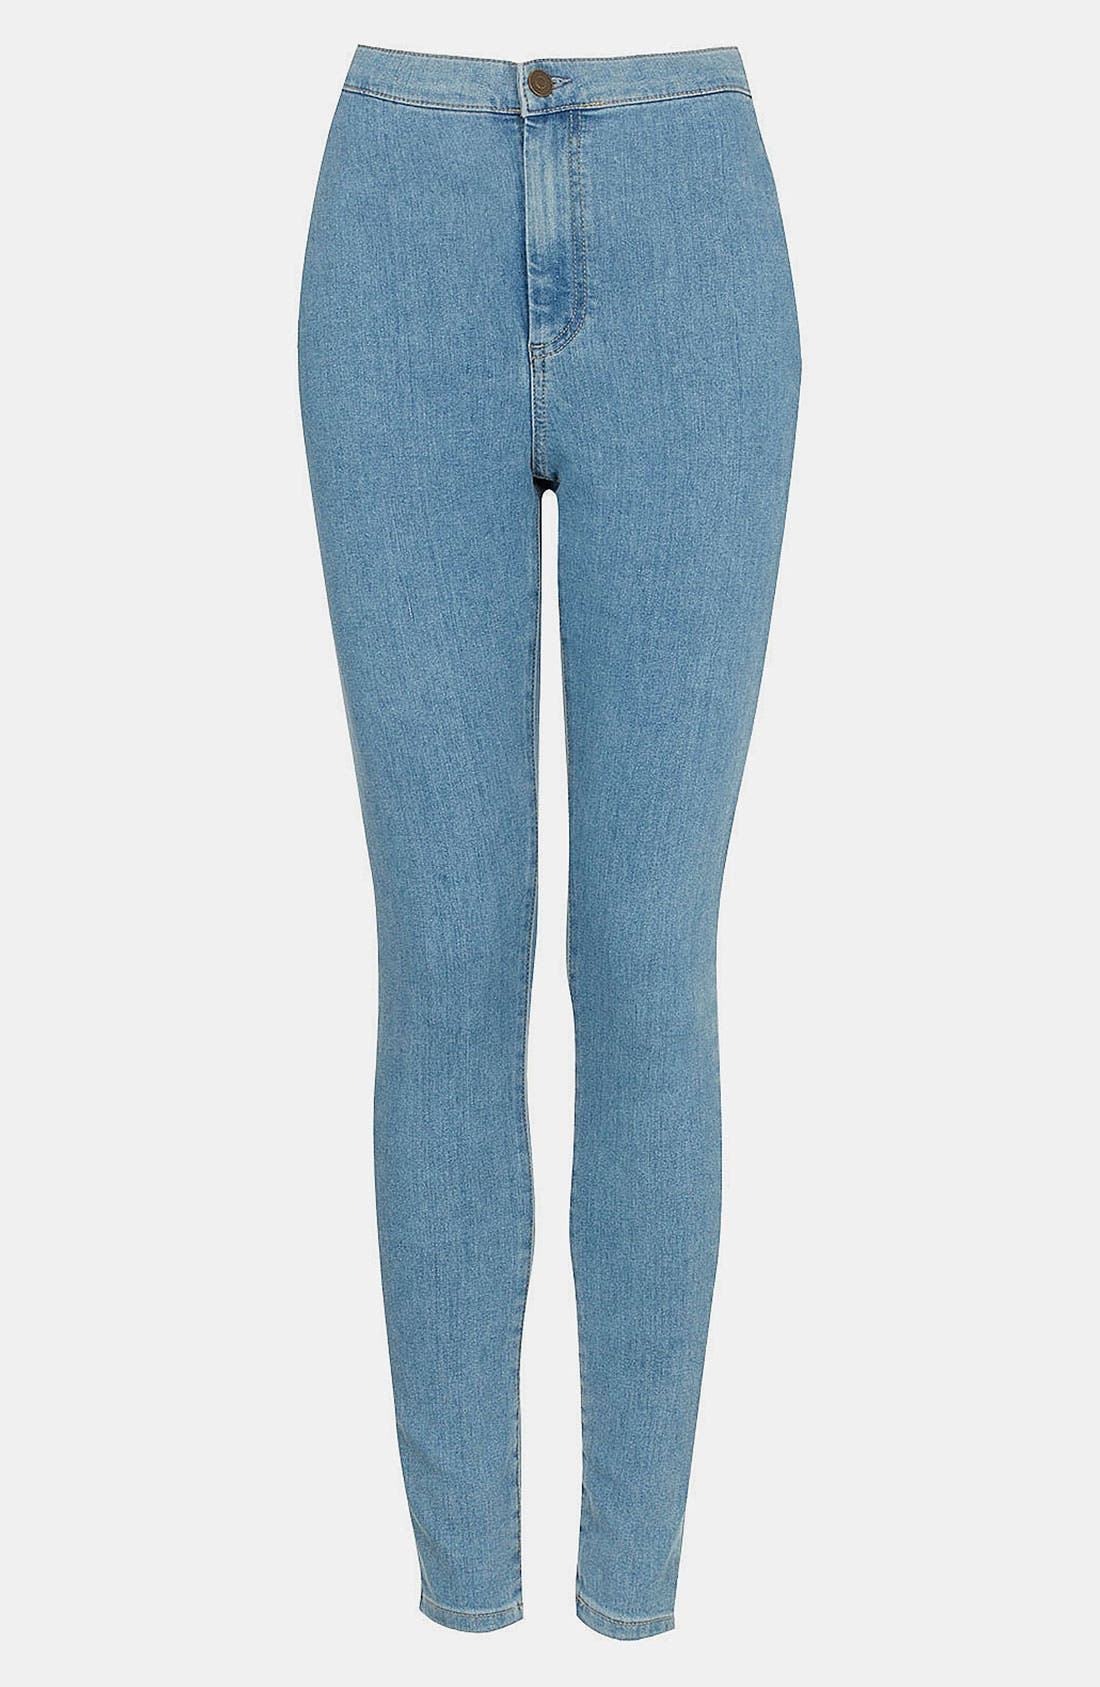 Alternate Image 1 Selected - Topshop Moto 'Joni' High Waist Skinny Jeans (Mid Stone) (Short)